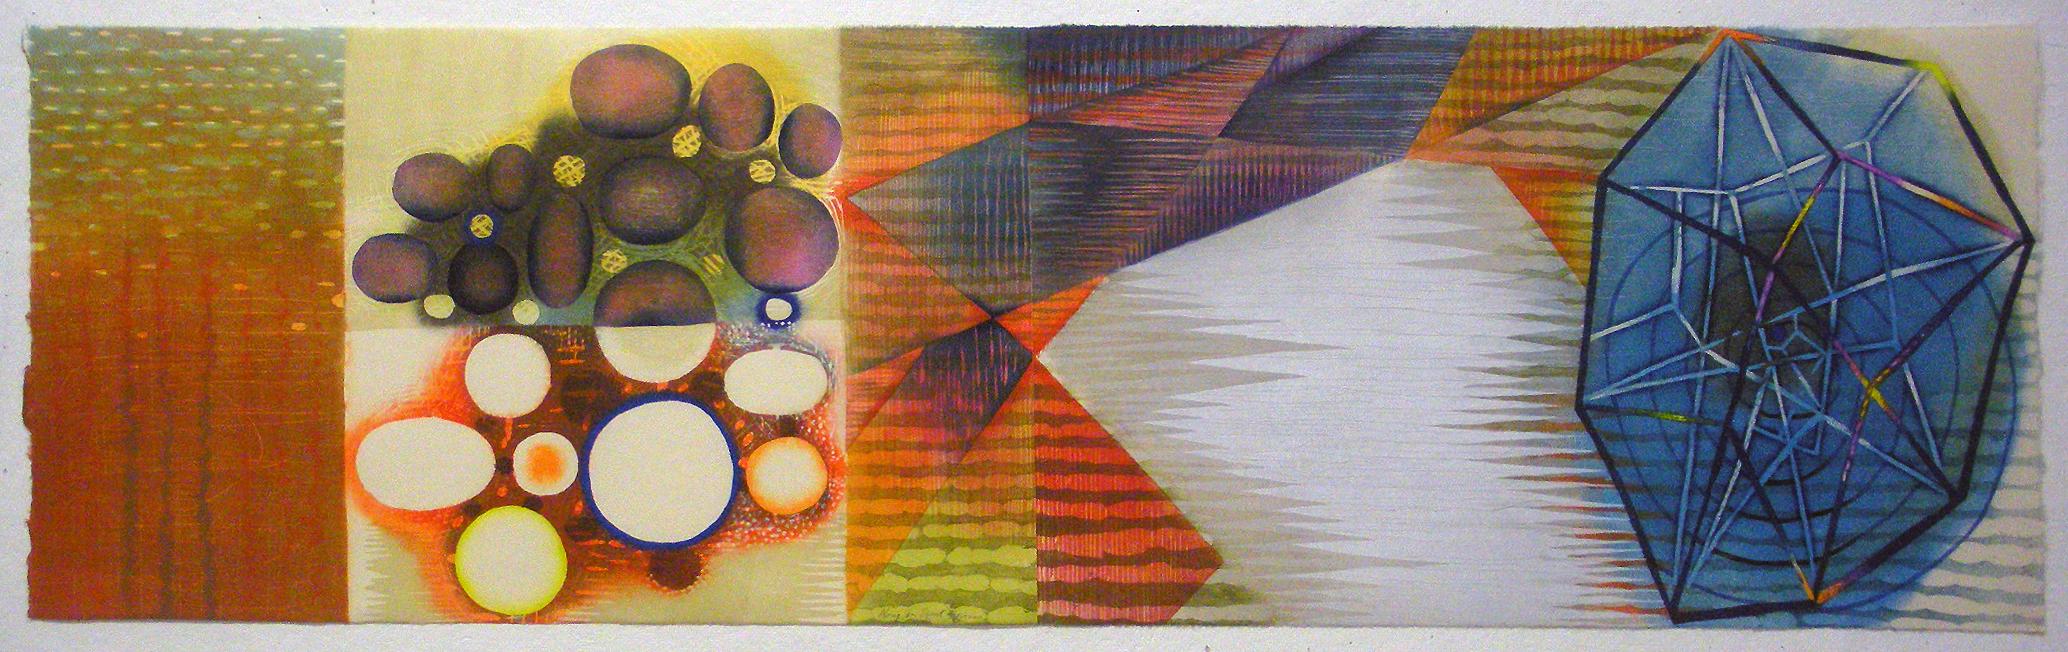 "Karen Kunc  (BIO) ,  Along an Event Horizon  ,2013, woodcut, 21"" x 57"""